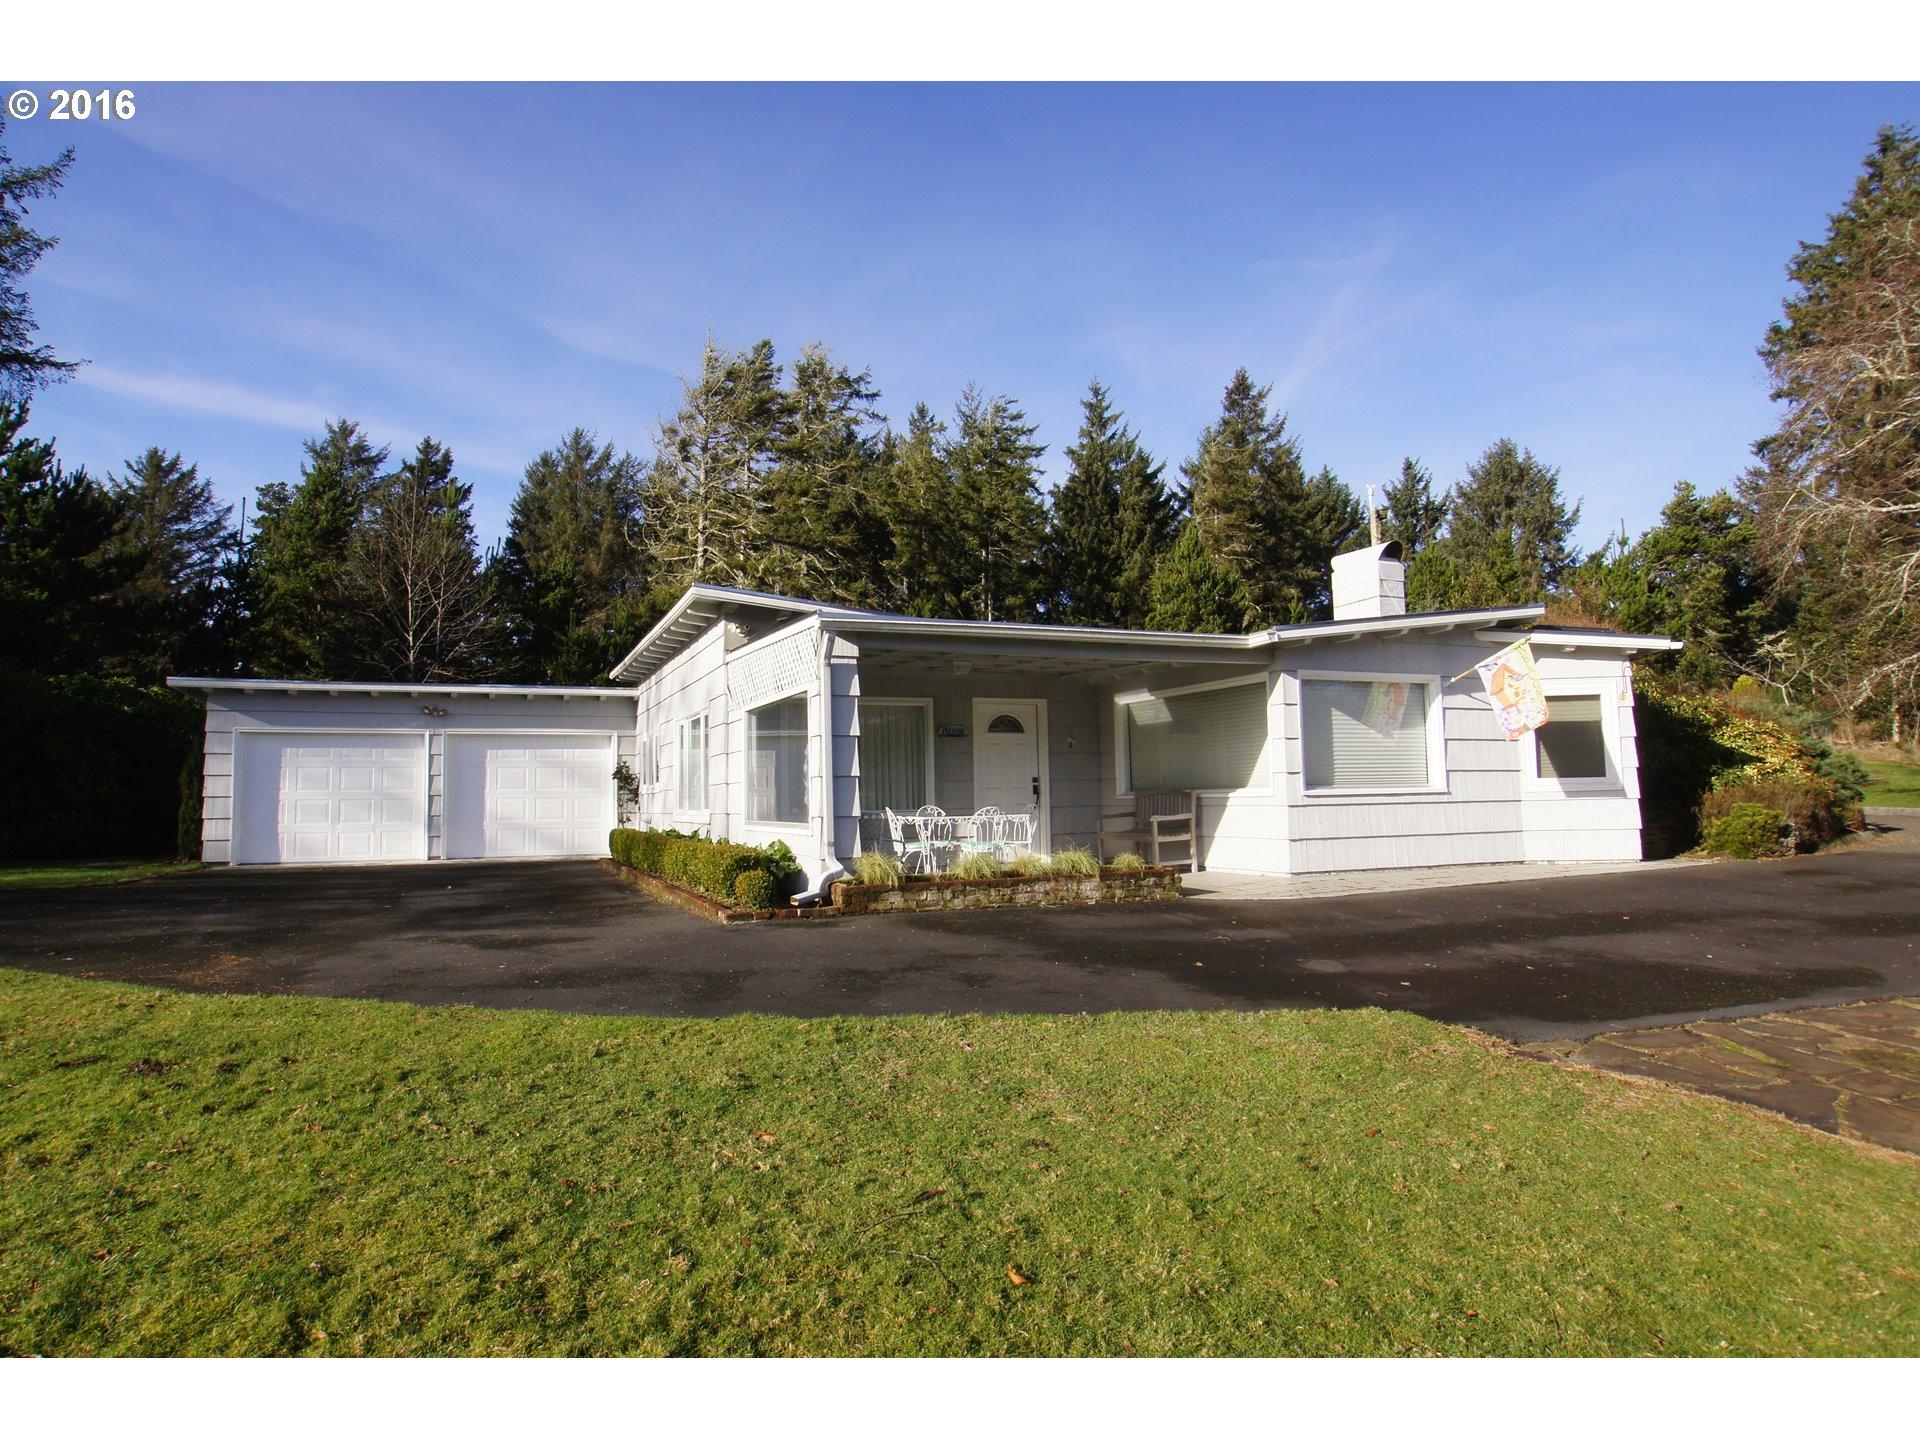 33252 Silverspot Ln, Warrenton, OR